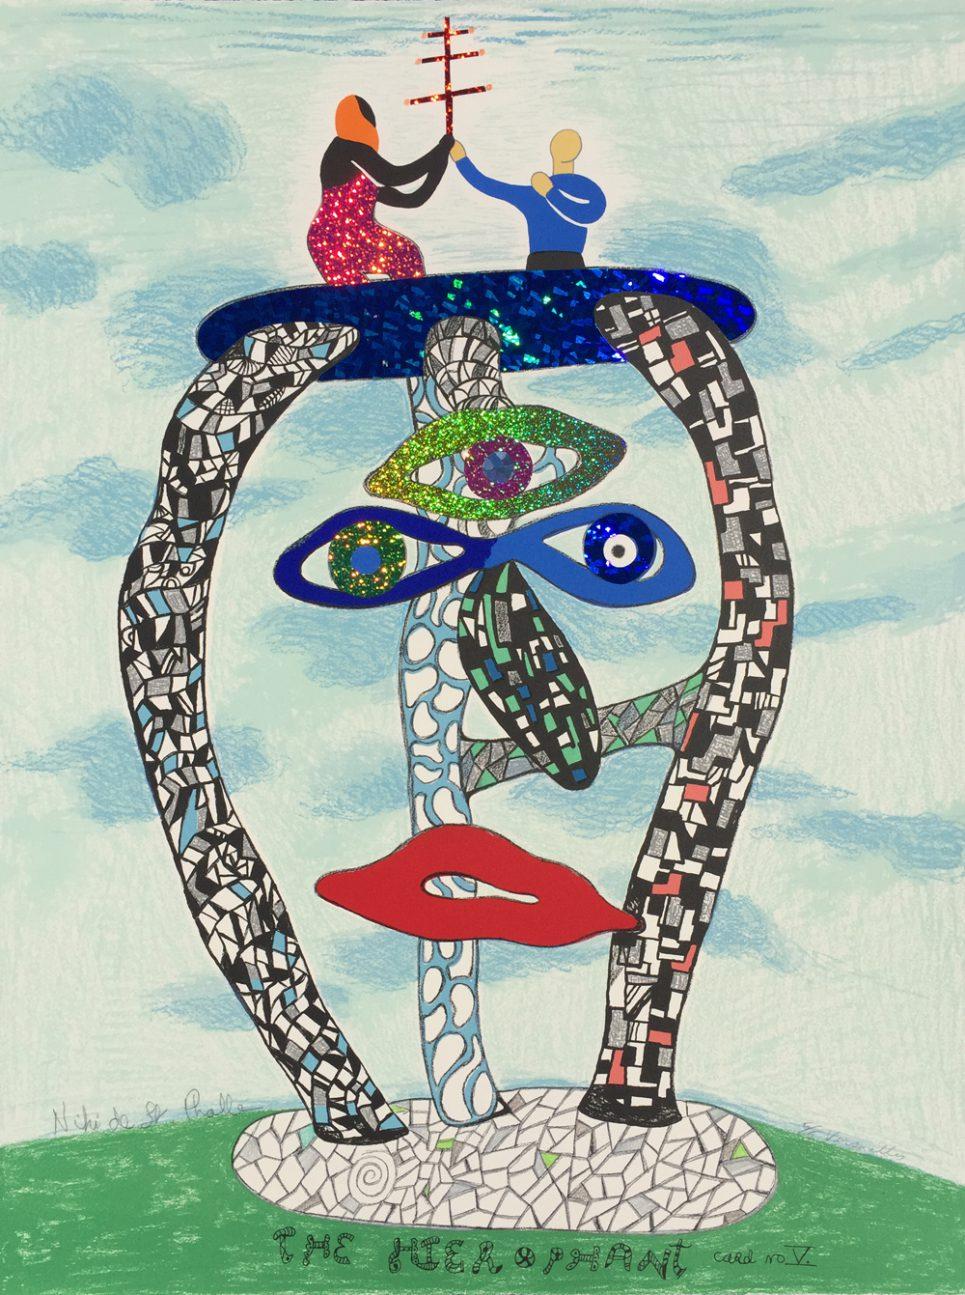 niki-st-phalle-the-hierophant-card-v